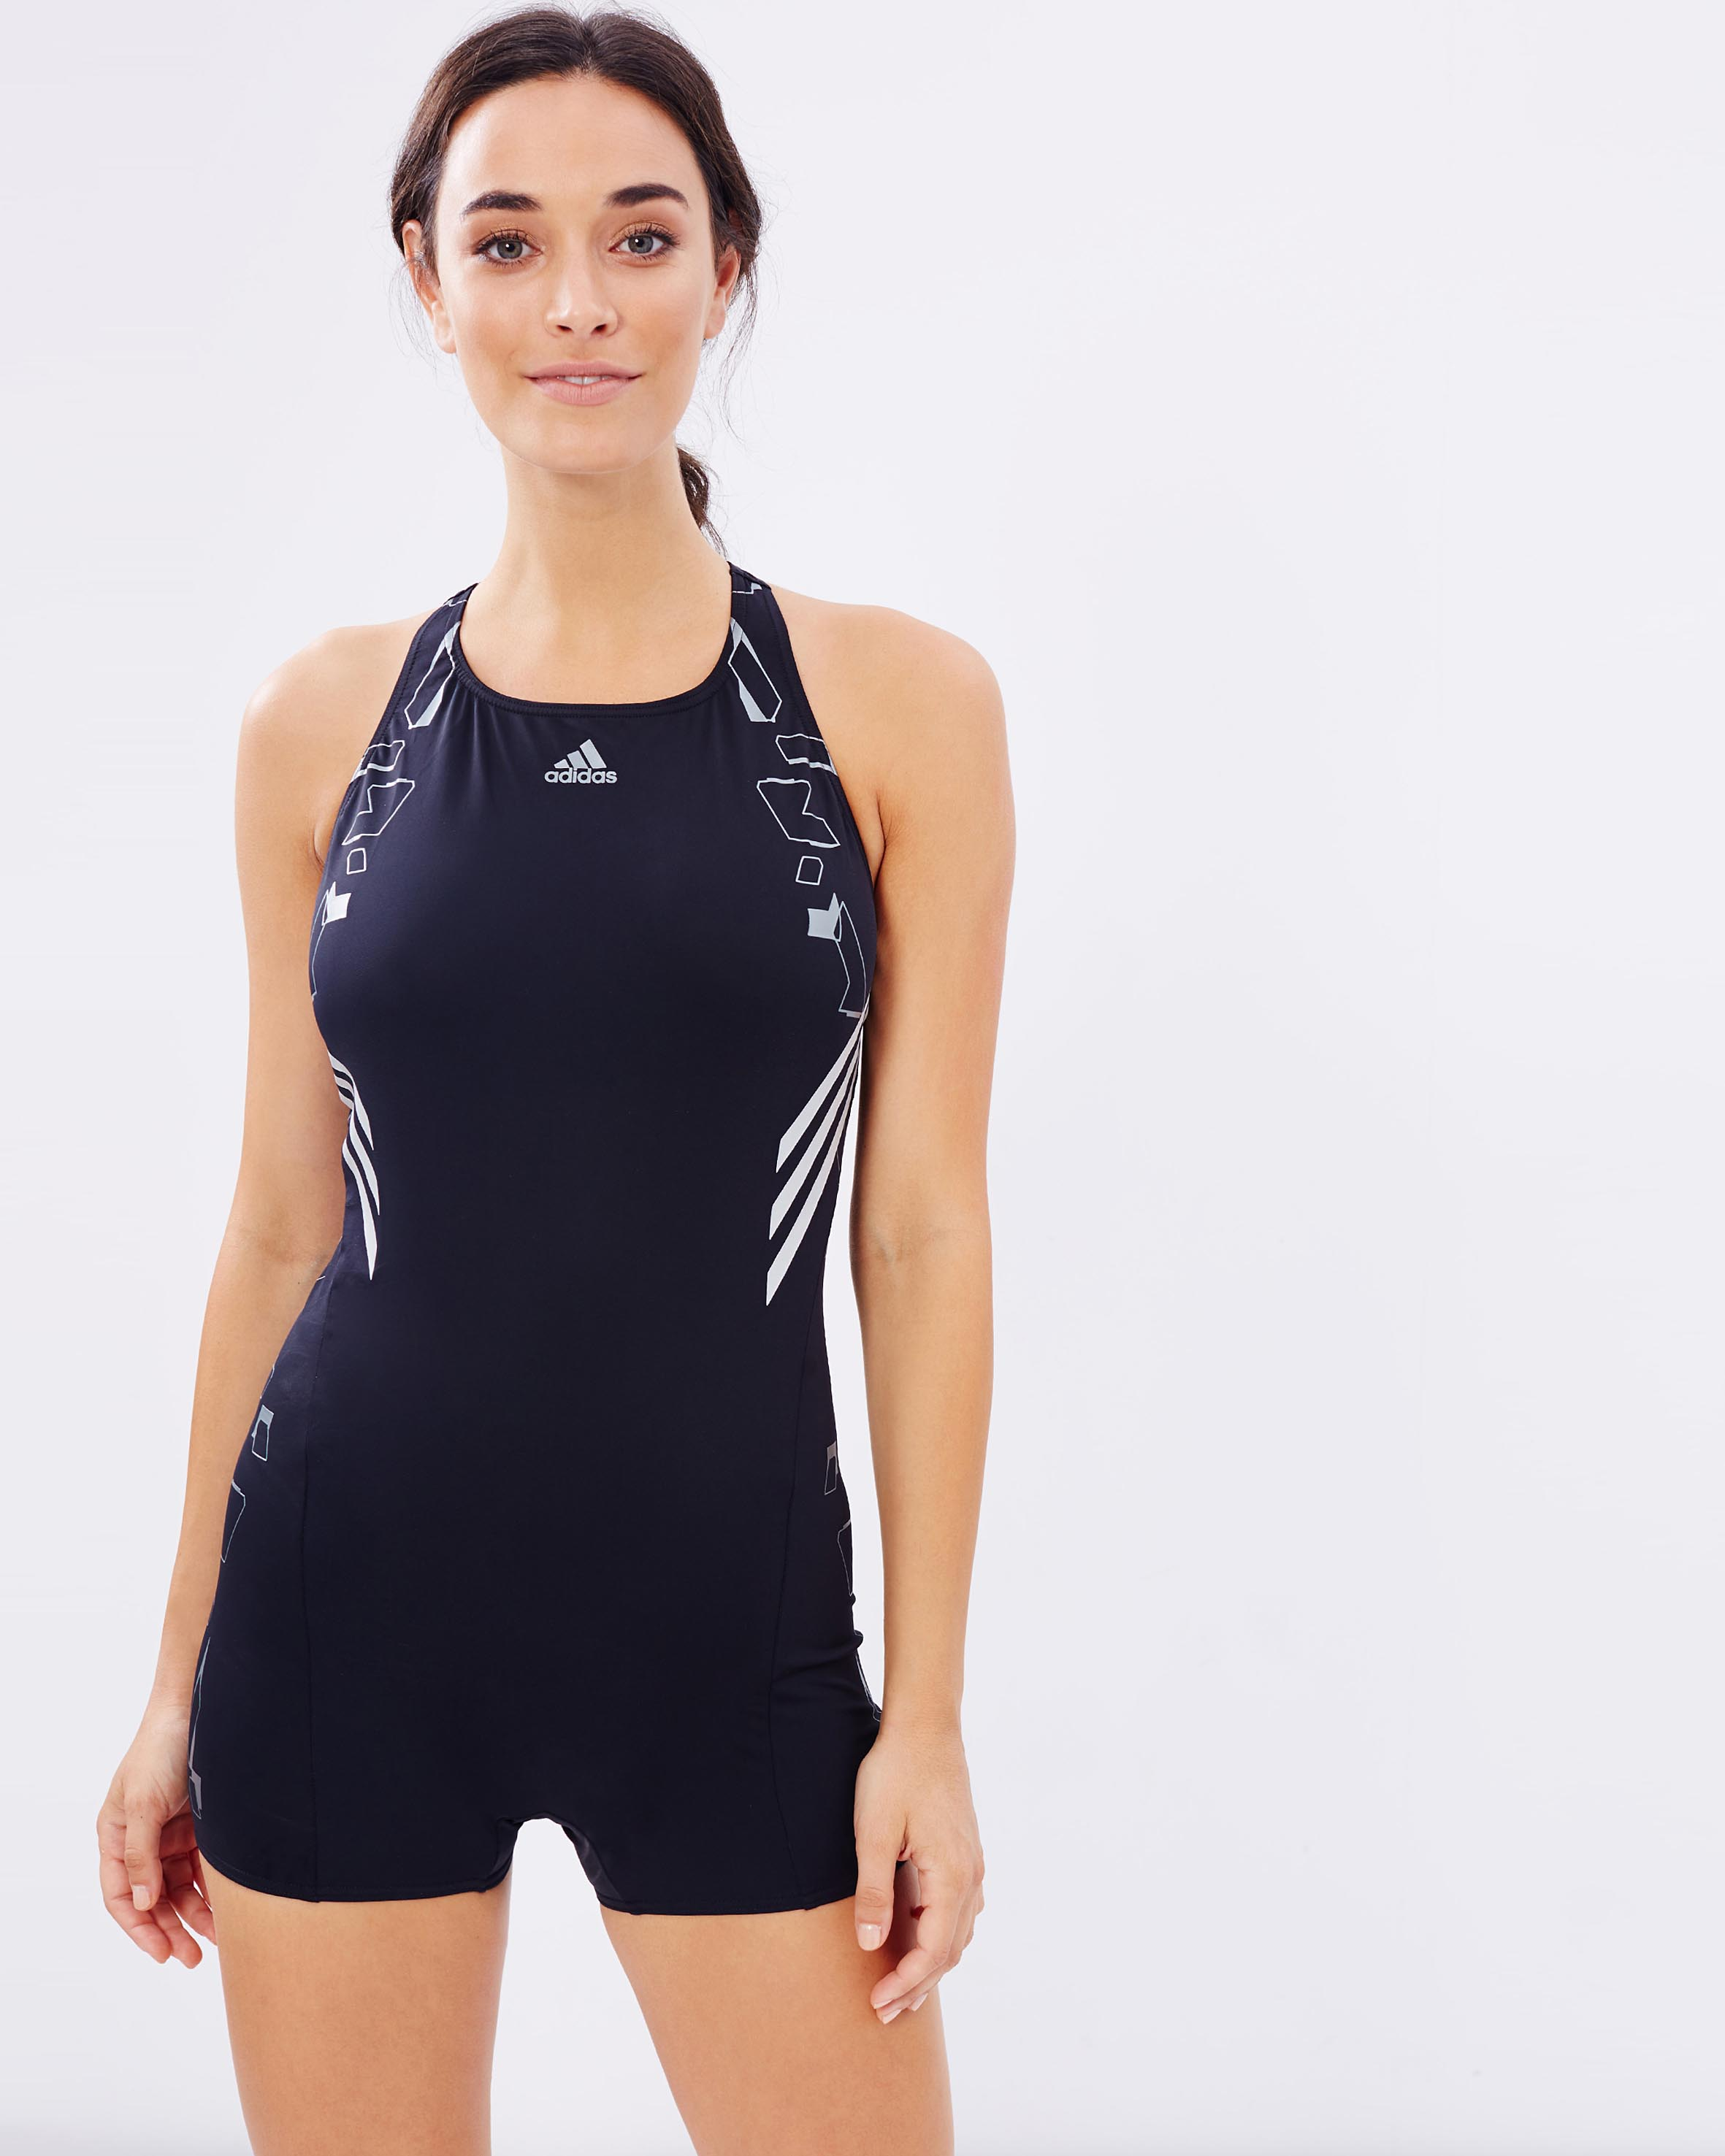 aa09d794115f5 adidas swimsuits sale | K&K Sound